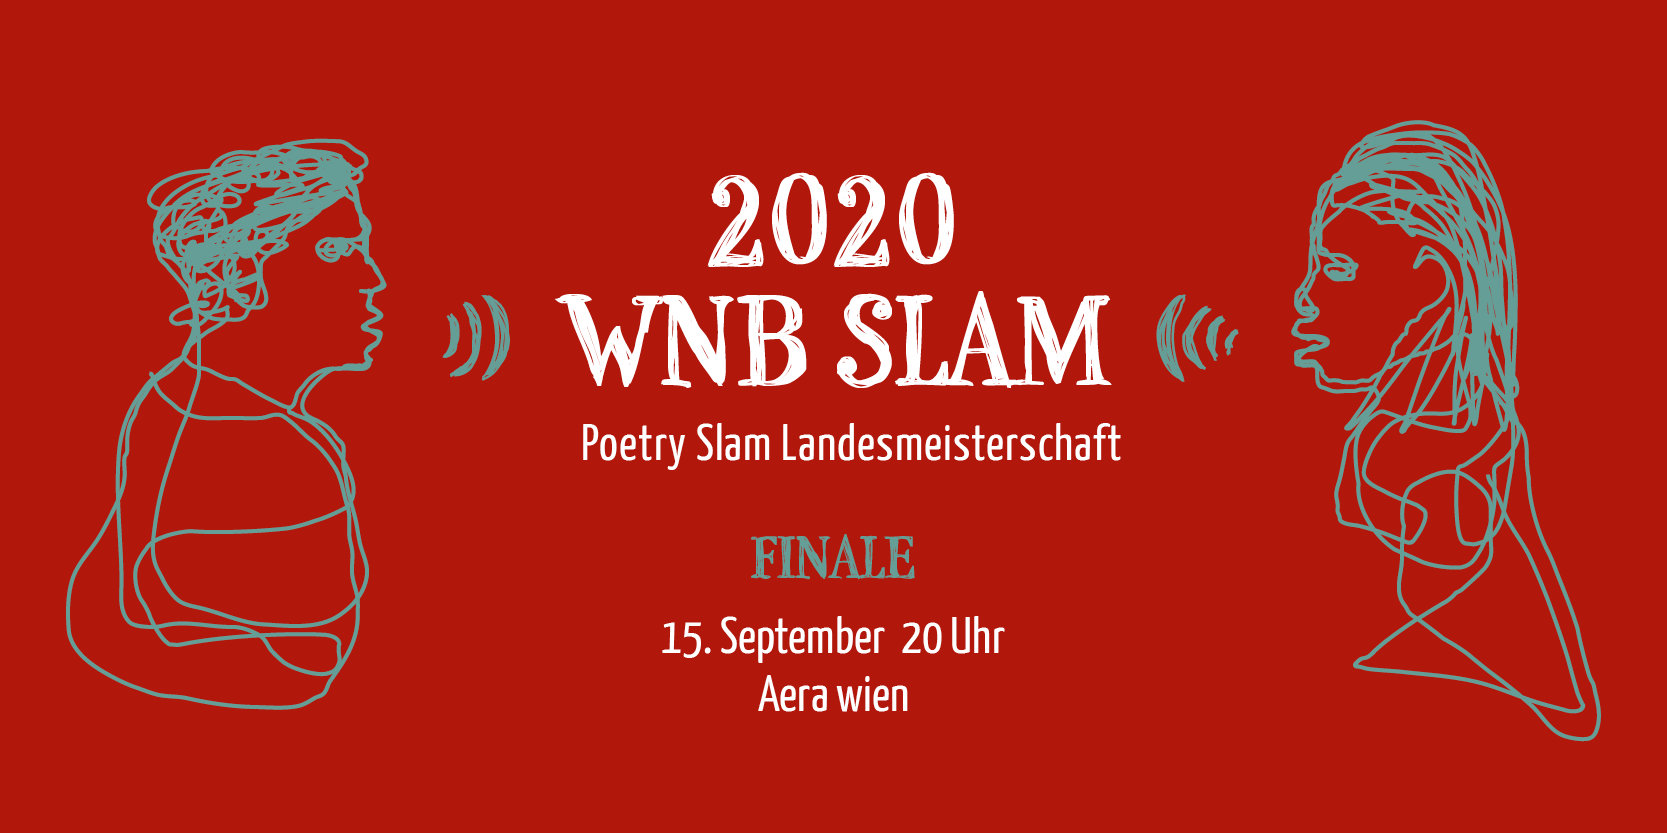 WNB SLAM 2020 FINALE am 15. September 2020 @ Aera.